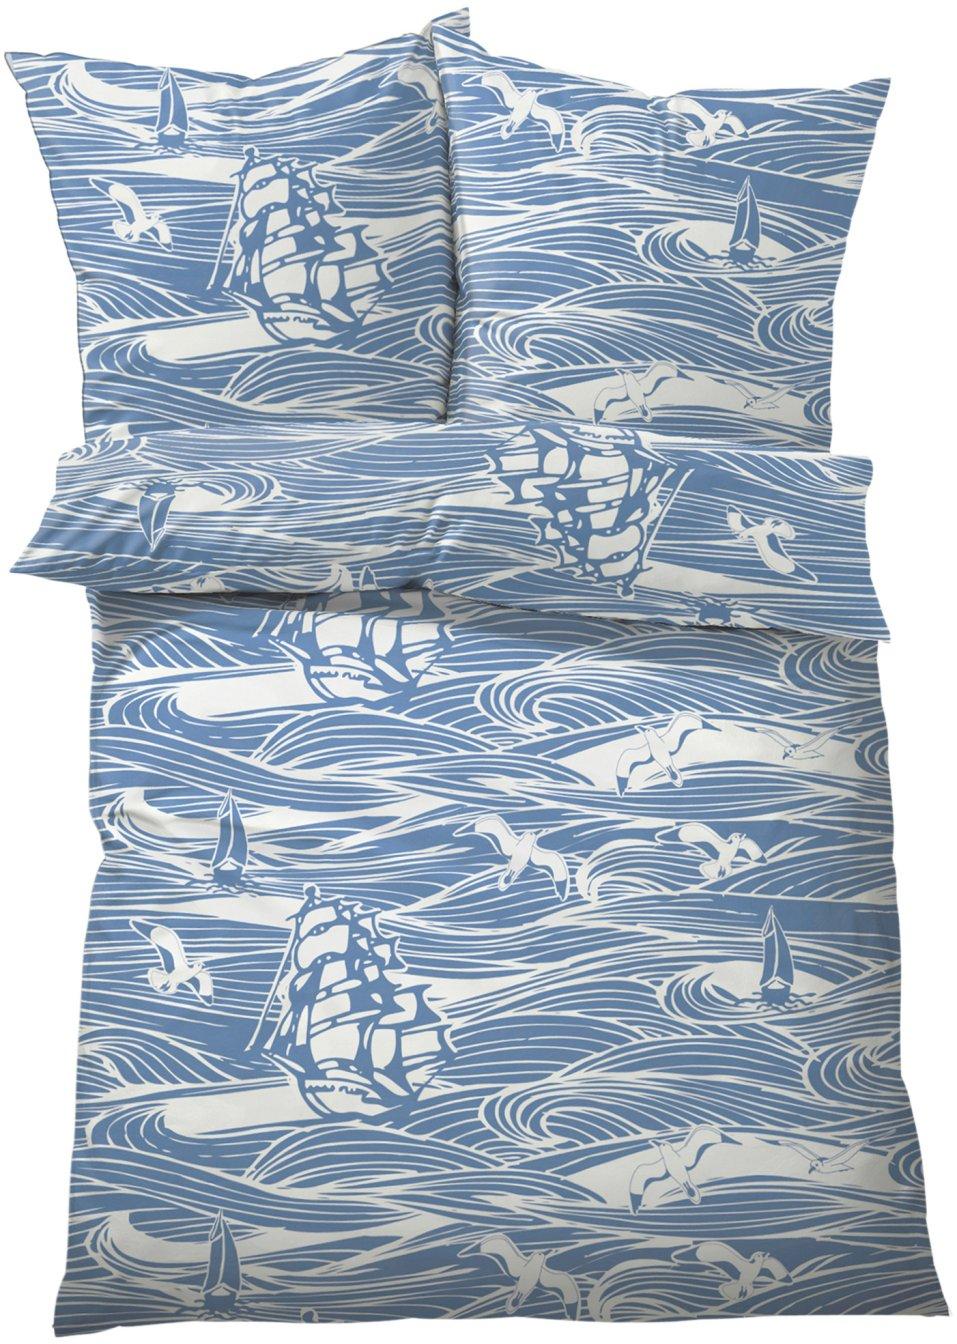 maritimer blickfang die bettw sche maritim blau linon. Black Bedroom Furniture Sets. Home Design Ideas